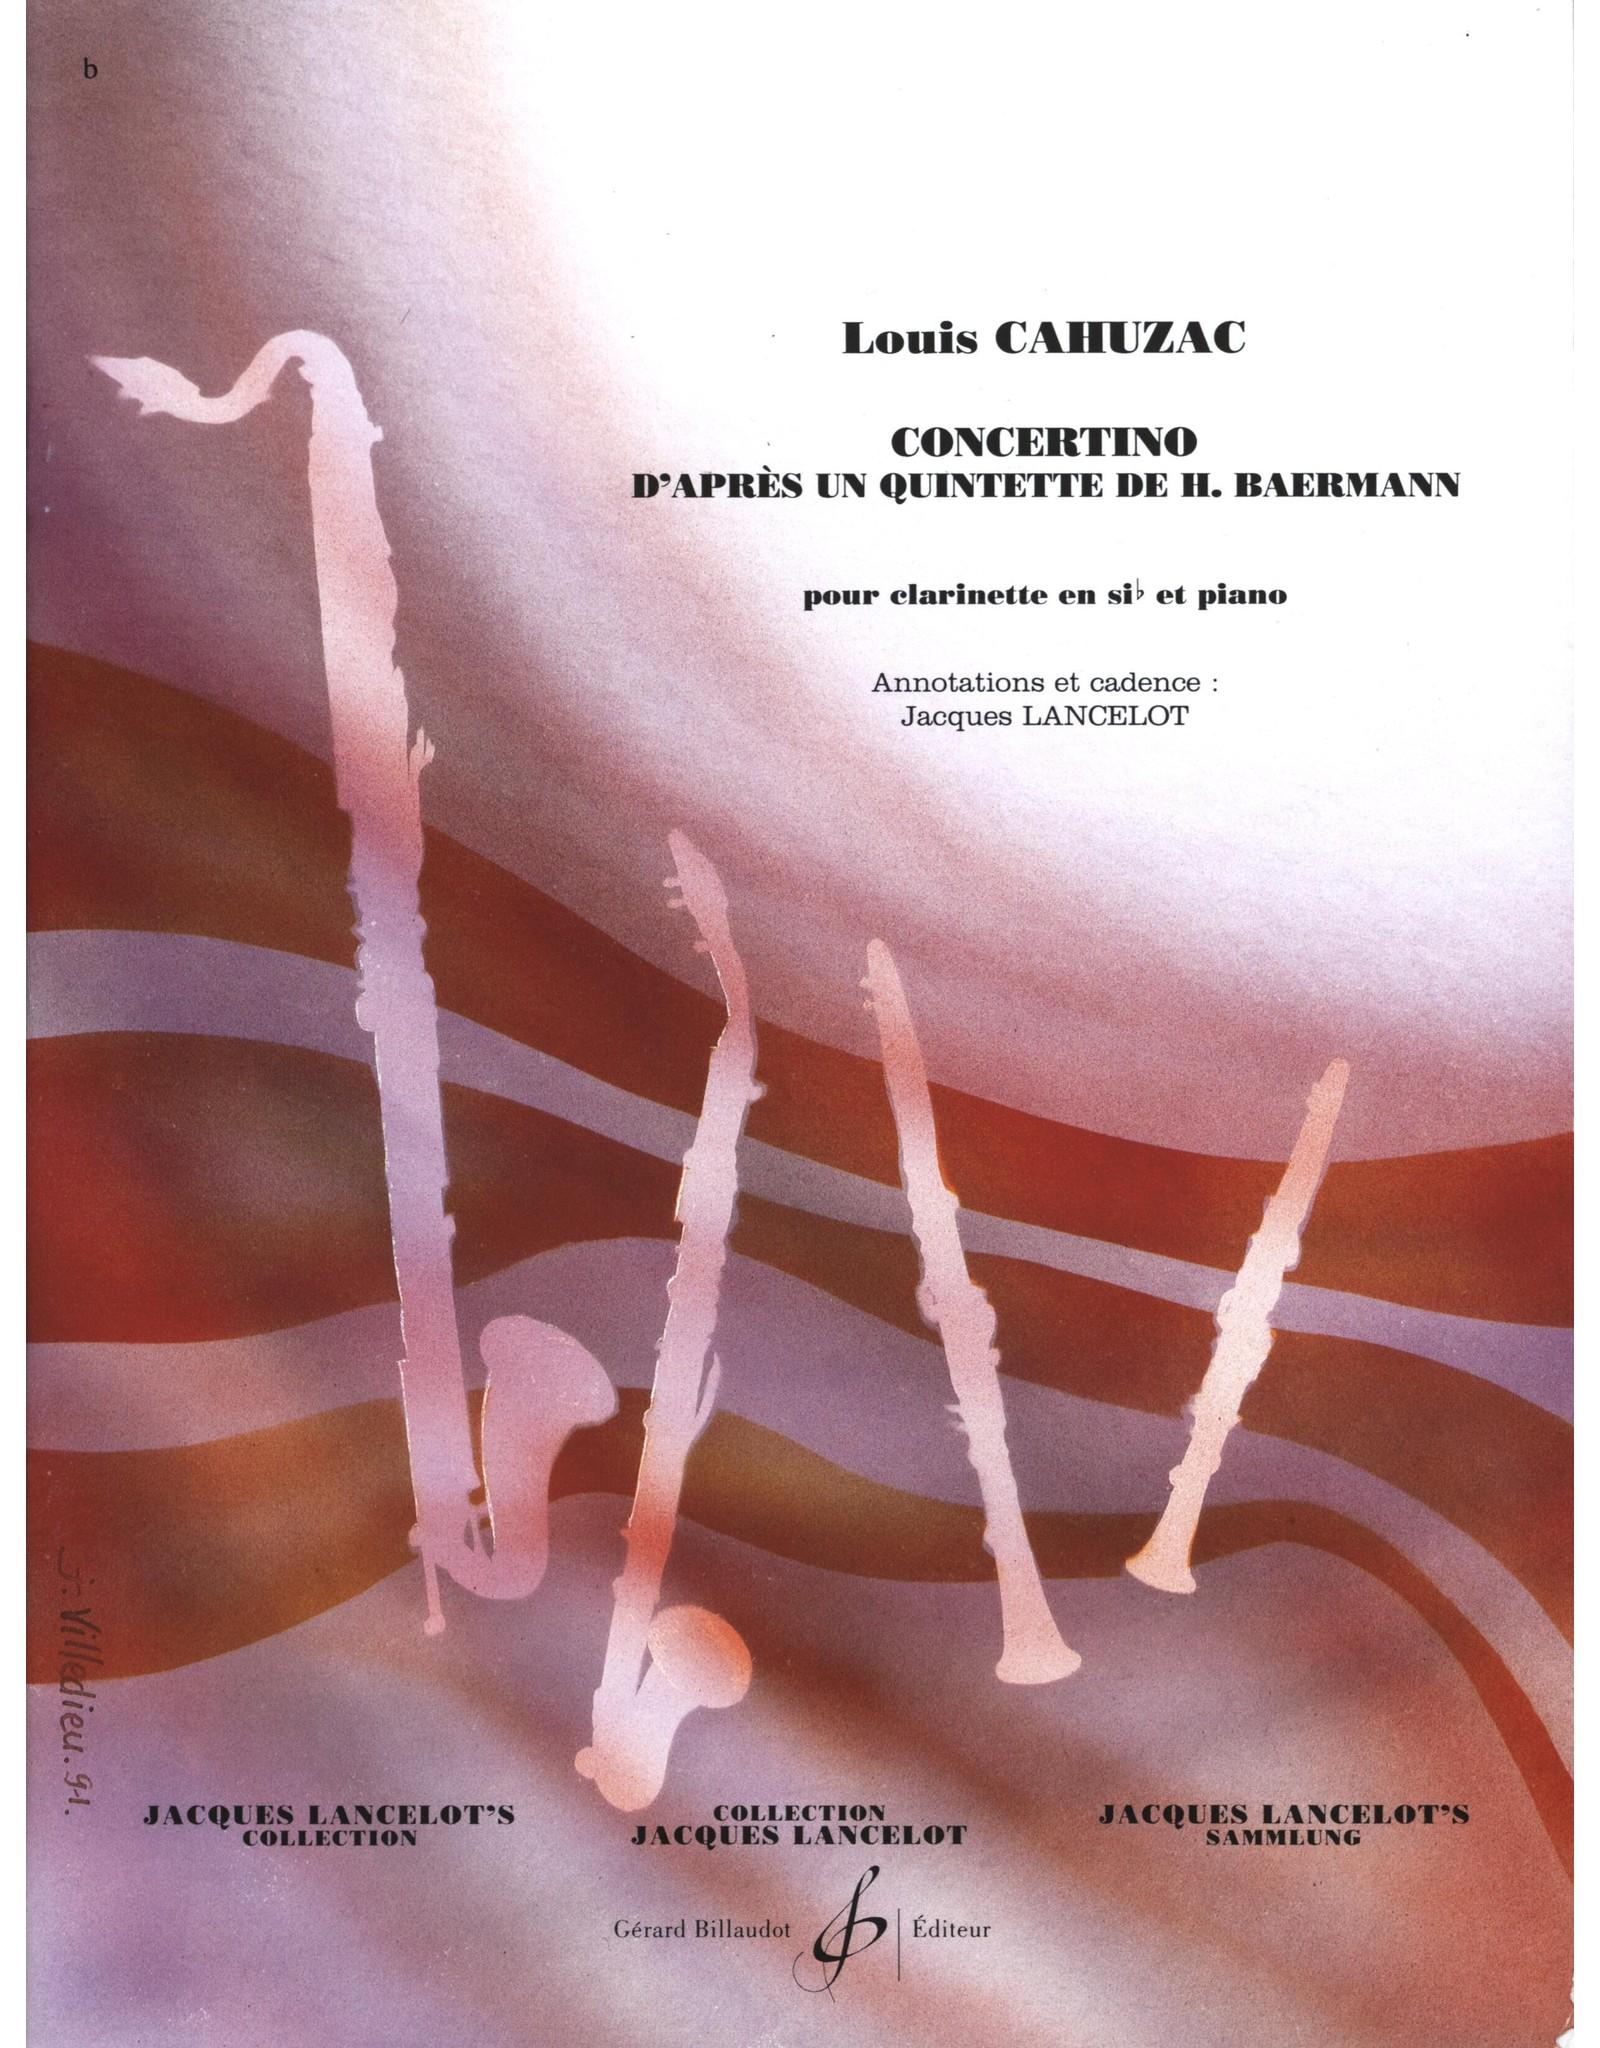 Gerard Billaudot Editeur Concertino Clarinet - Louis Cahuzac